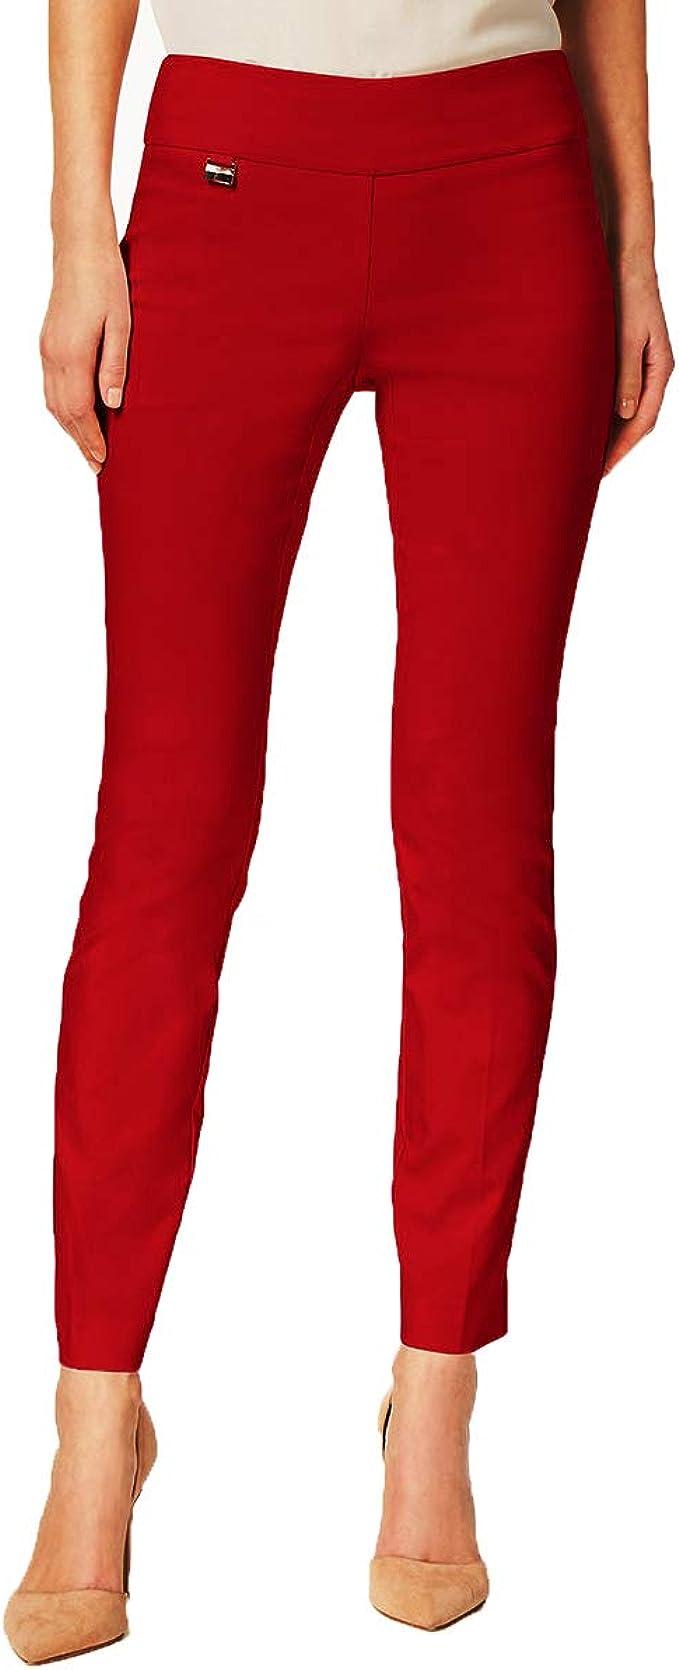 ALFANI Size 14P Petite Gray Skinny Leg Elastic Comfort Waist Pants NEW